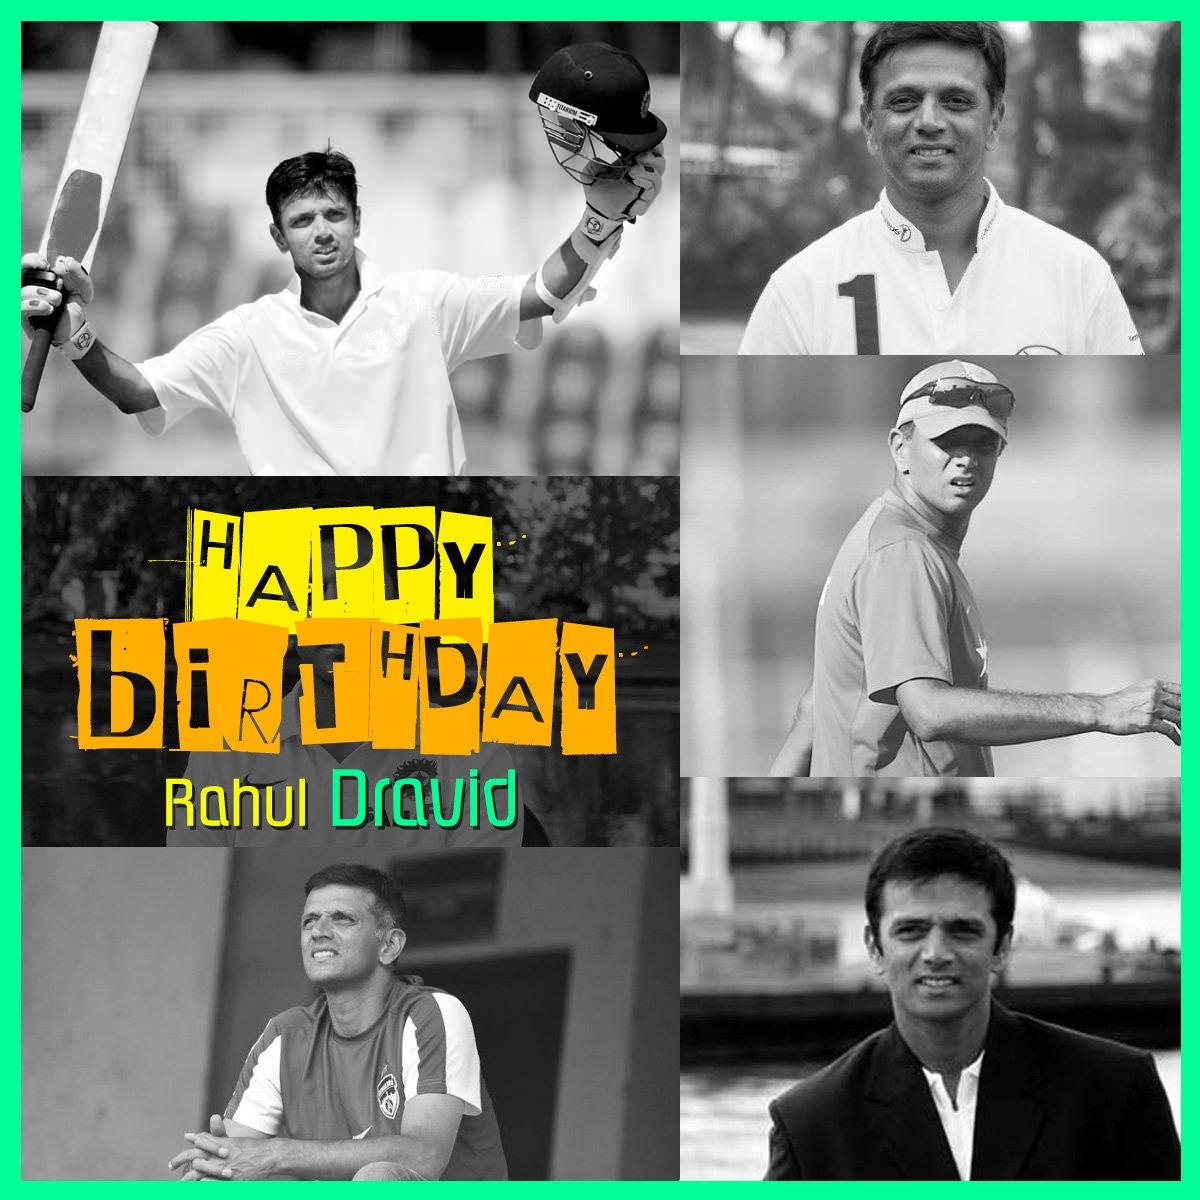 Wishing The Wall Of Cricket Rahul Dravid A Very Happy Birthday